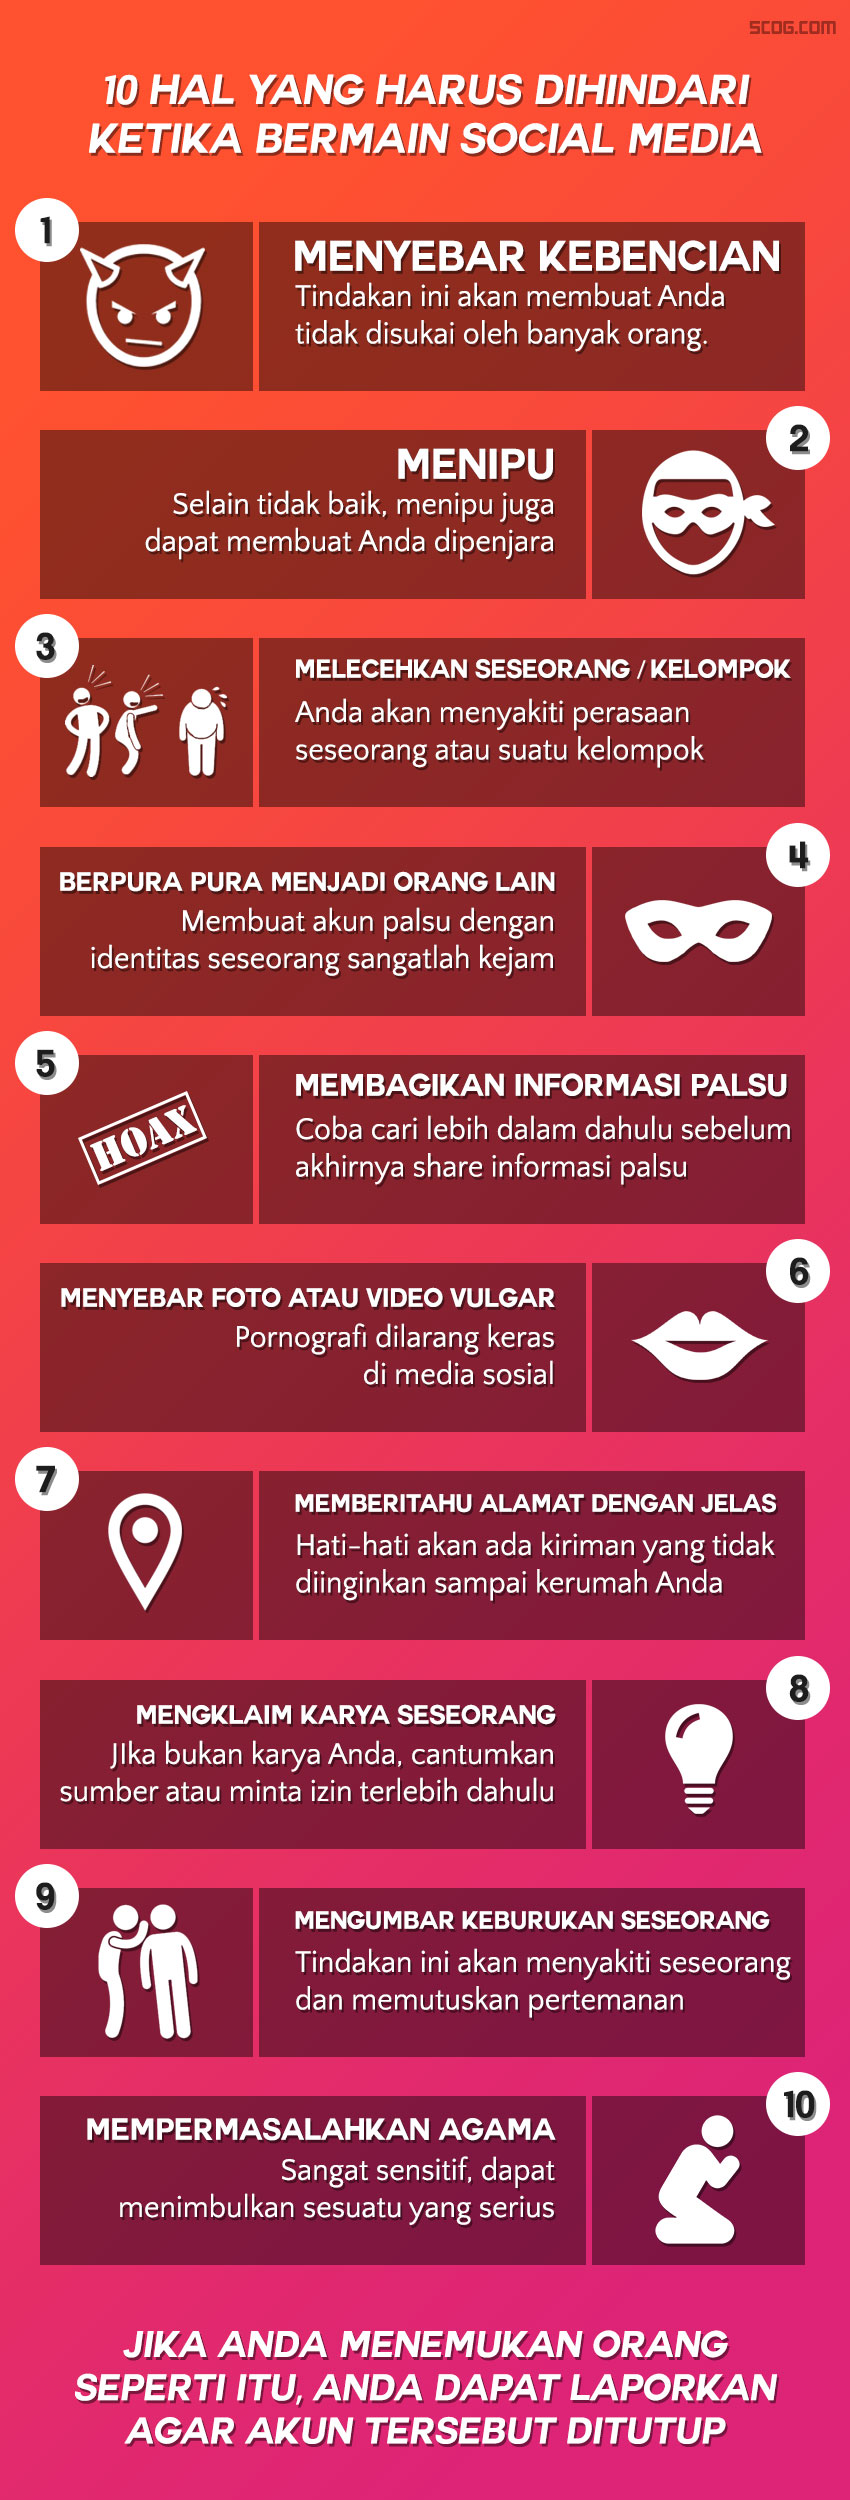 10 hal yang harus dihindari ketika bermain social media